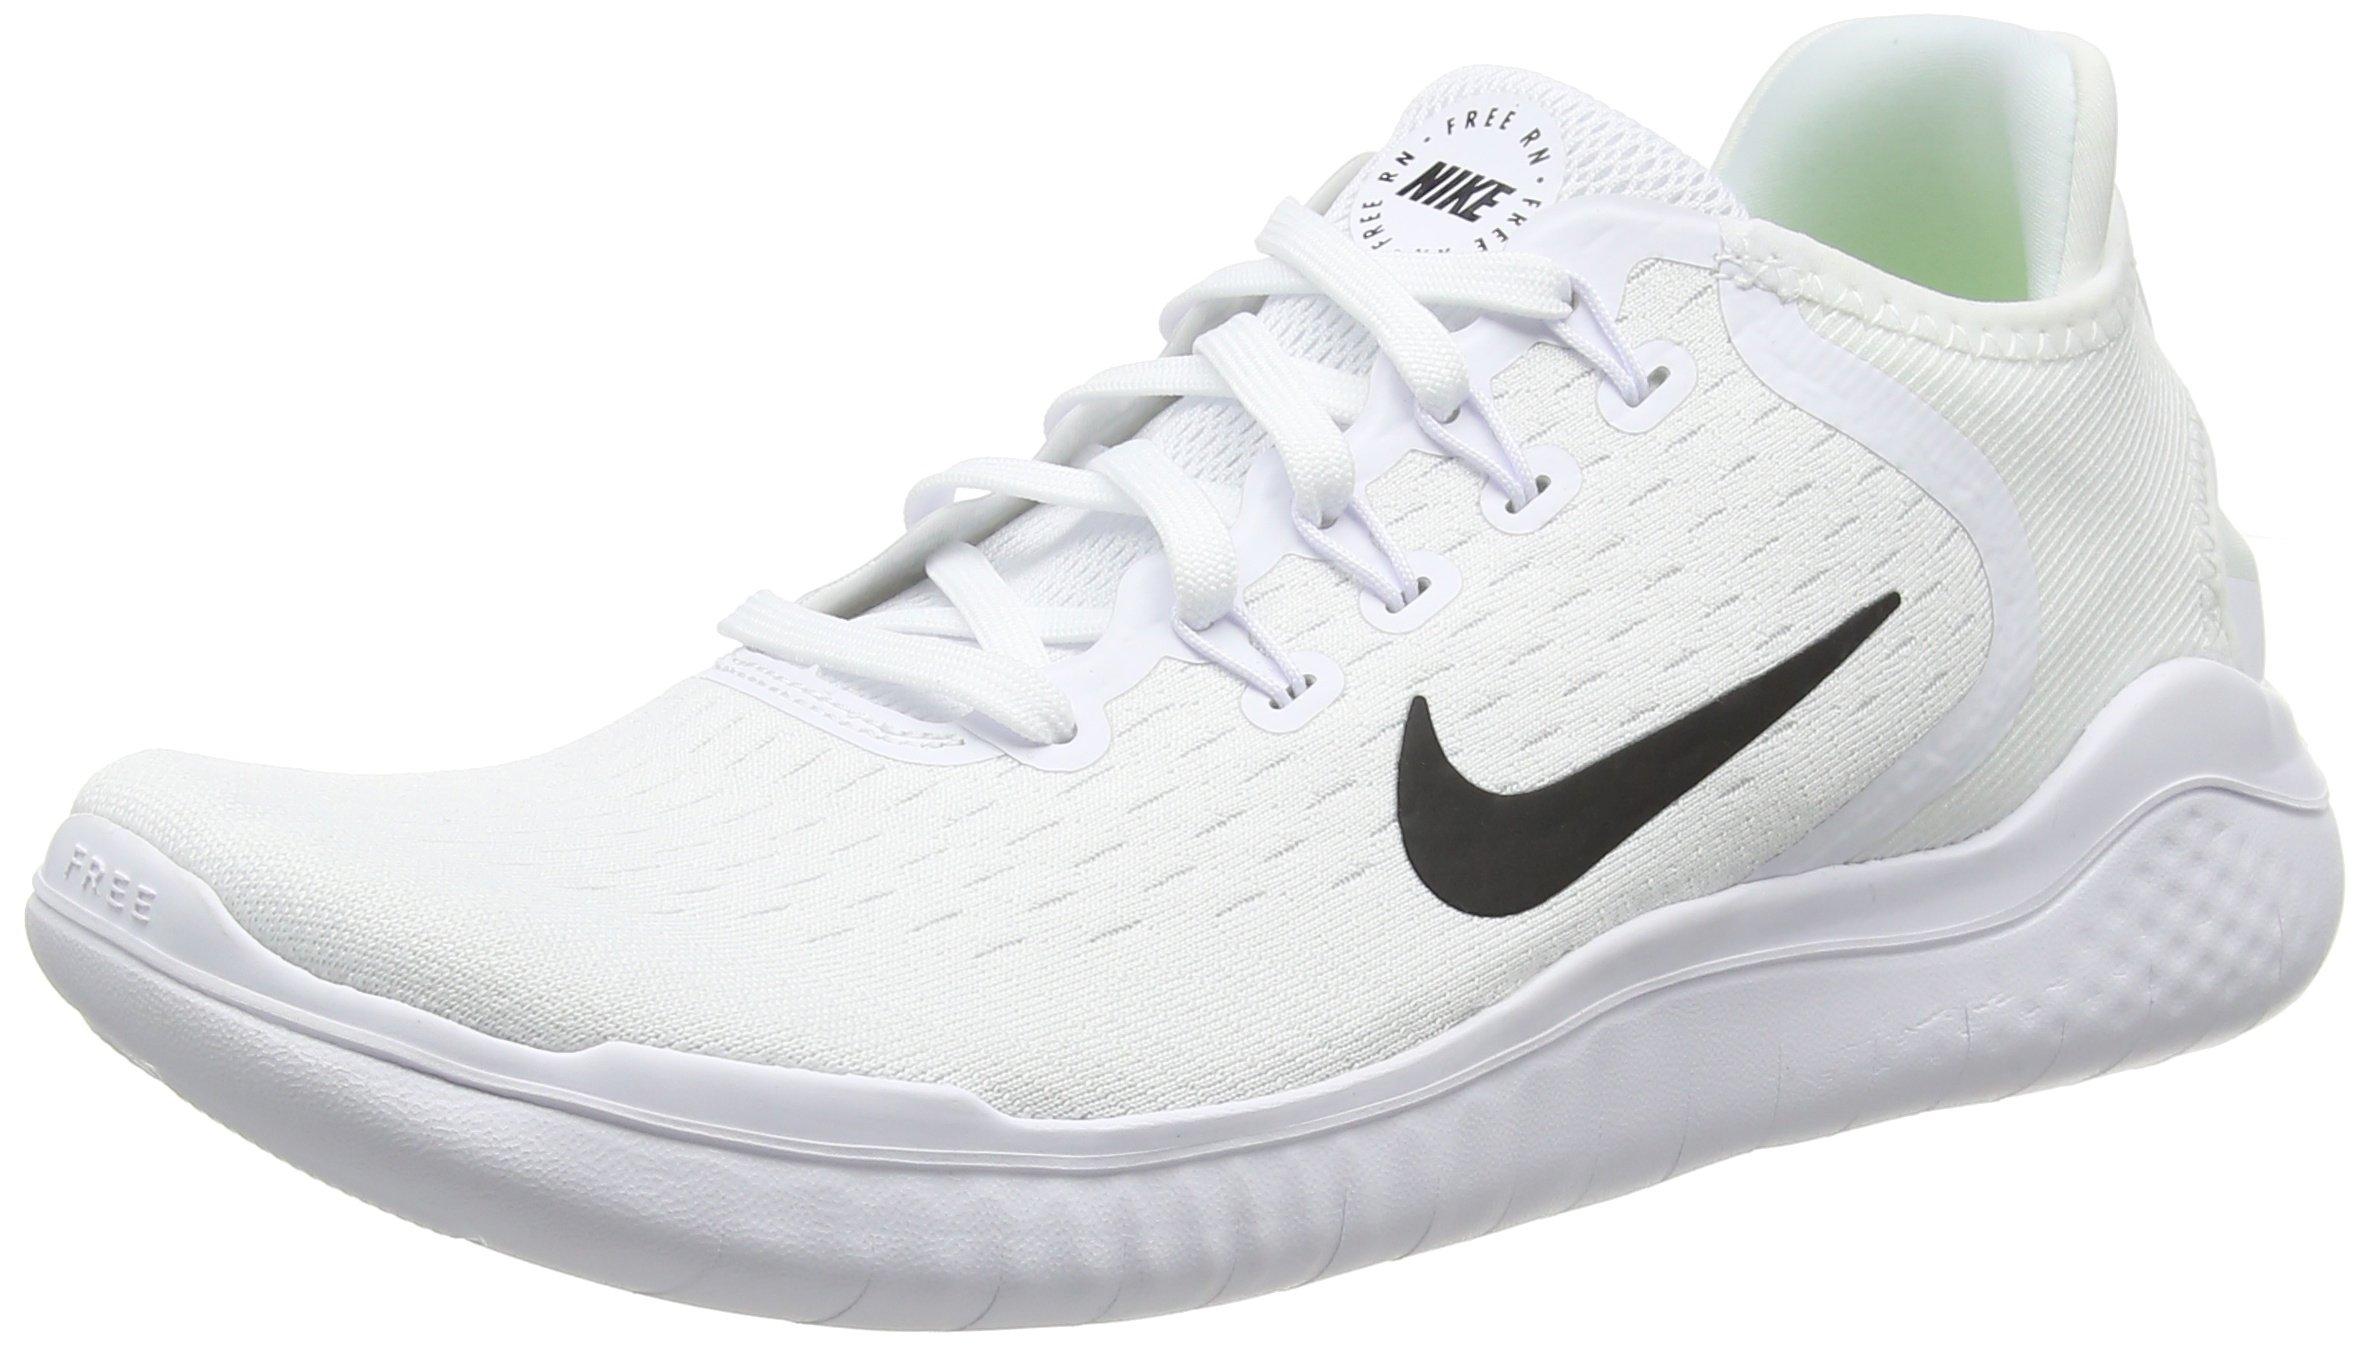 Nike Free RN 2018, Zapatillas de Running para Hombre